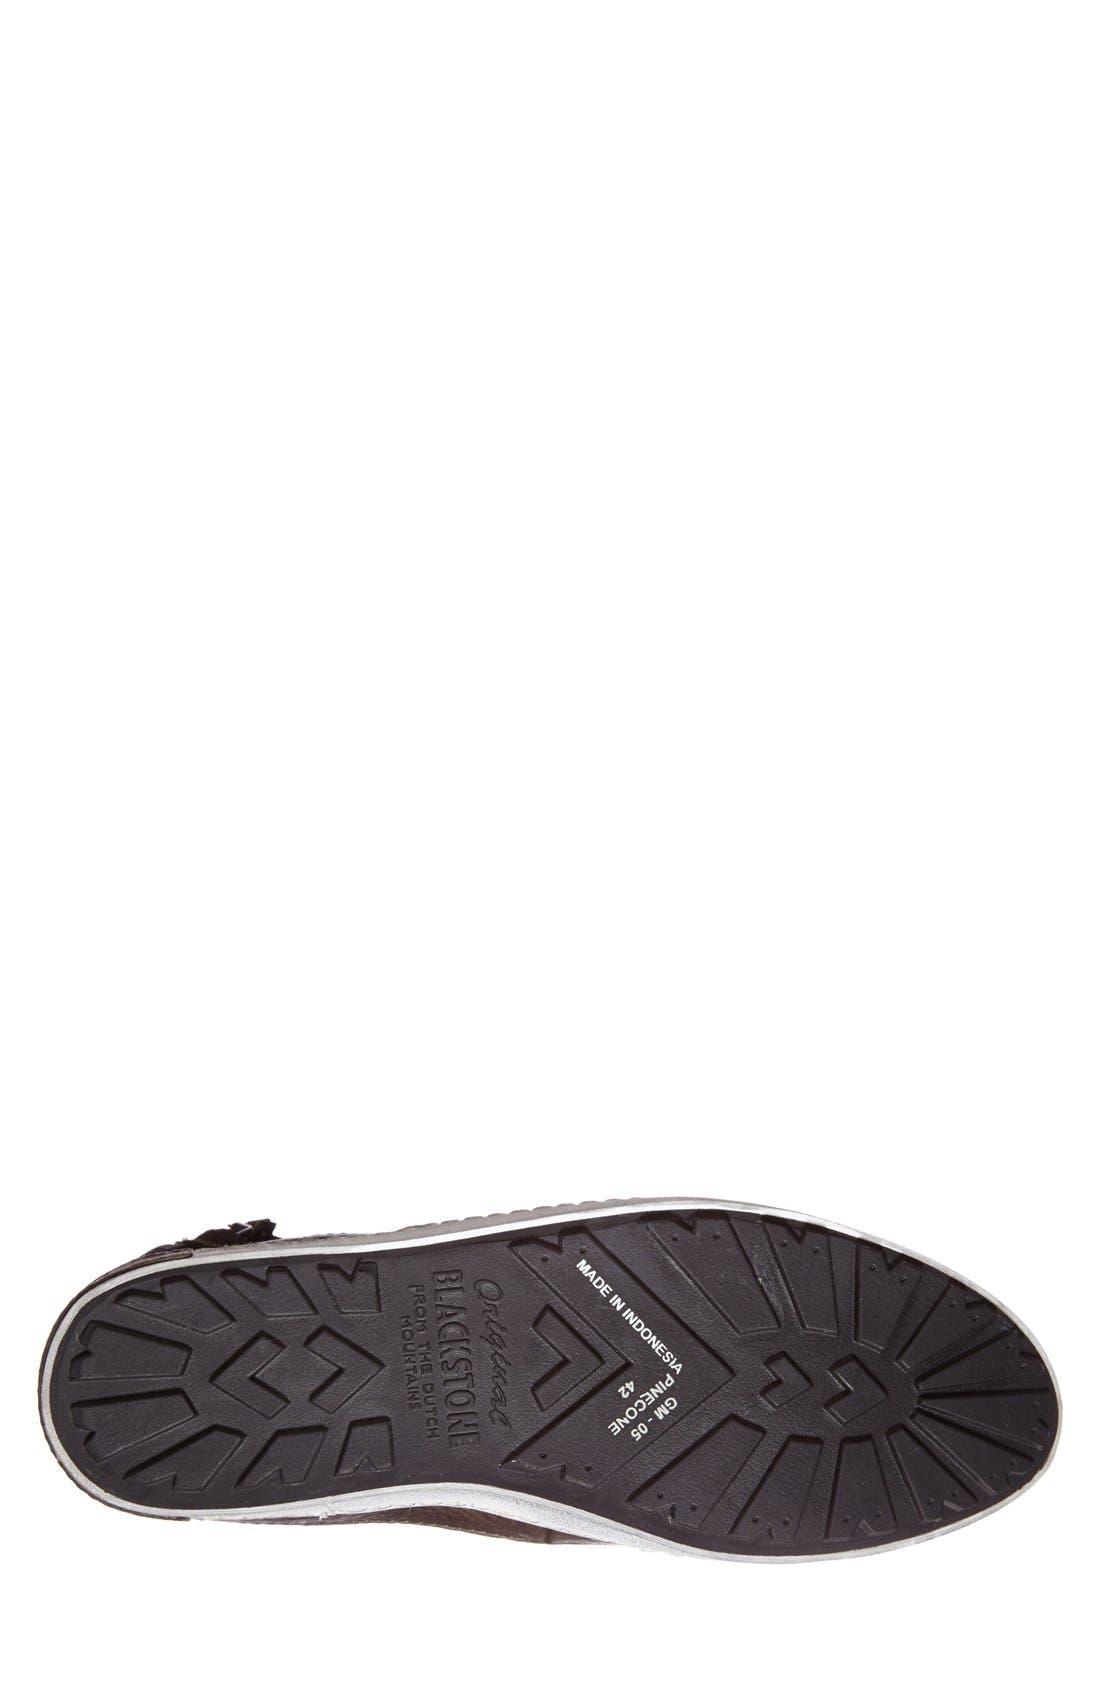 'GM05' High Top Sneaker,                             Alternate thumbnail 4, color,                             207